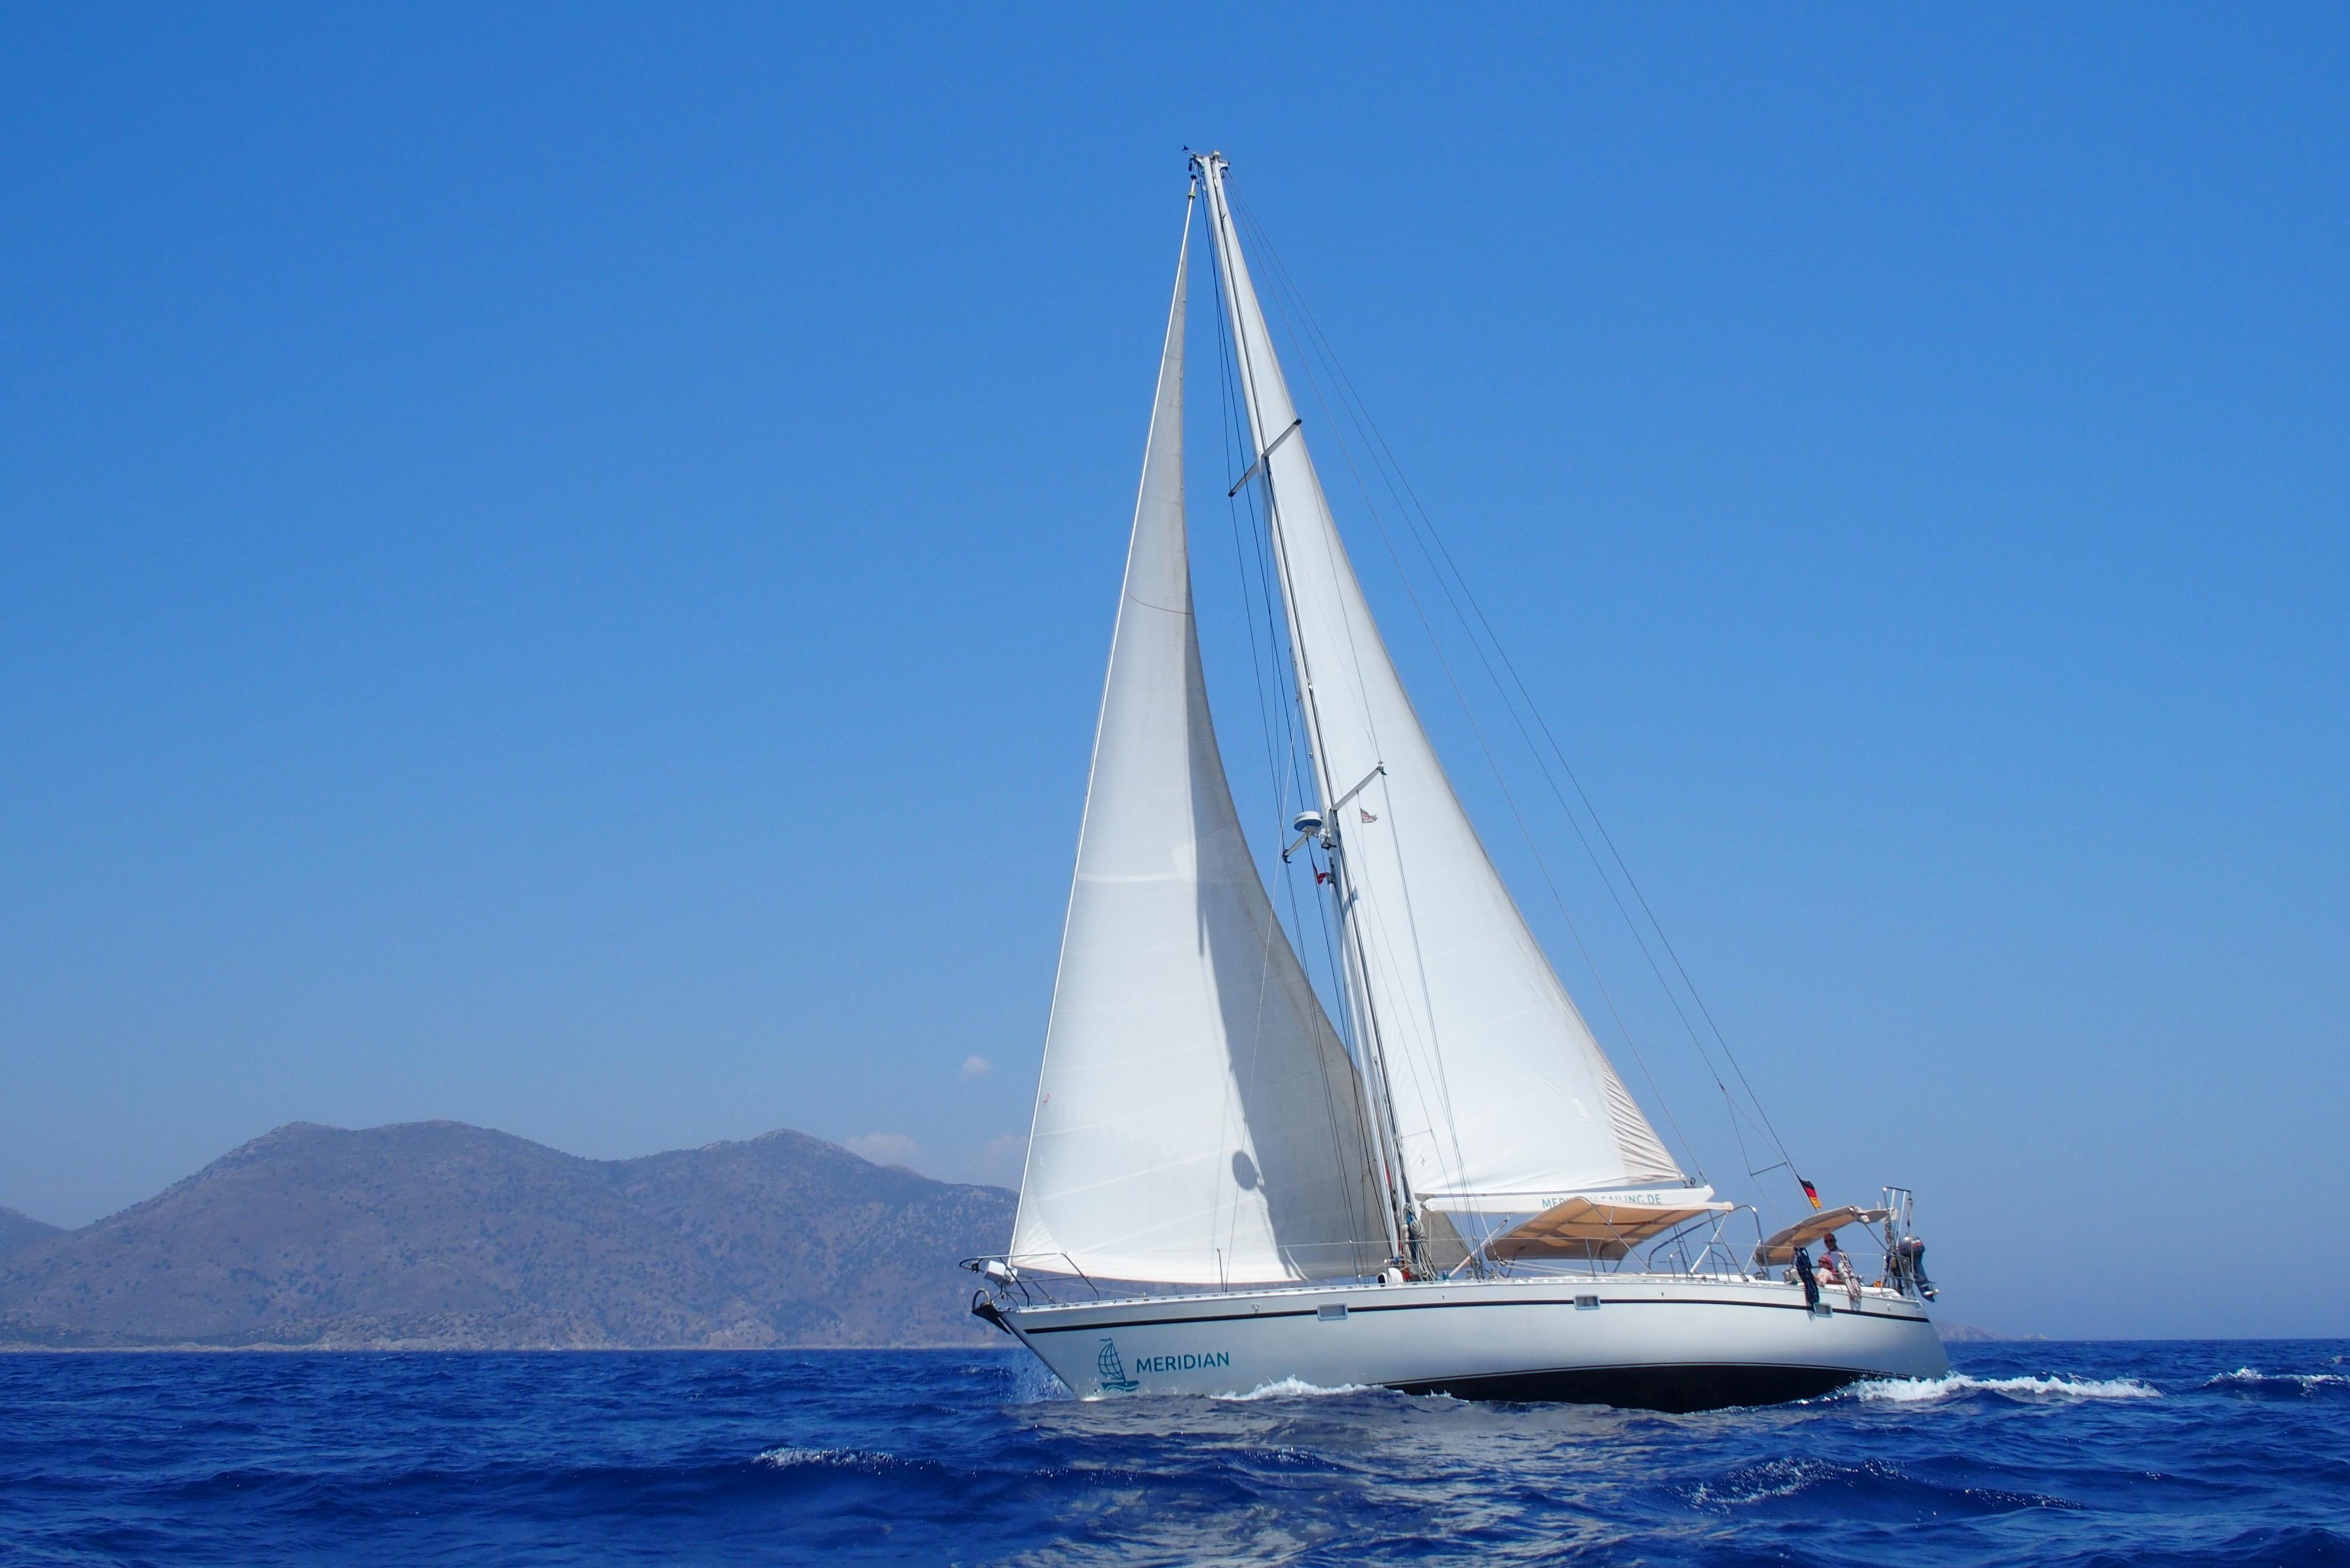 Gib Sea 52.2 master